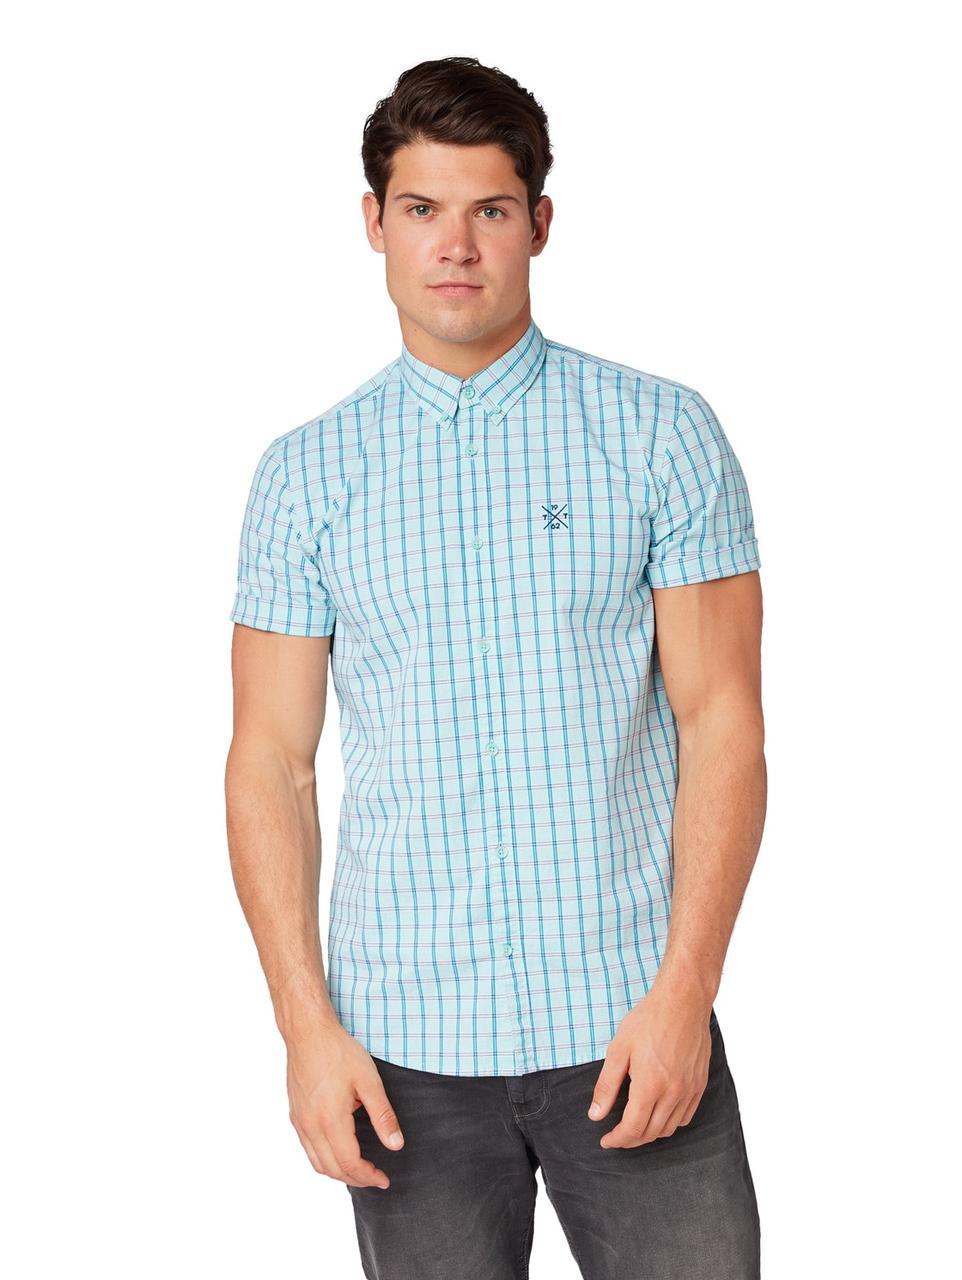 Рубашка Tom Tailor 1010871 L Голубой